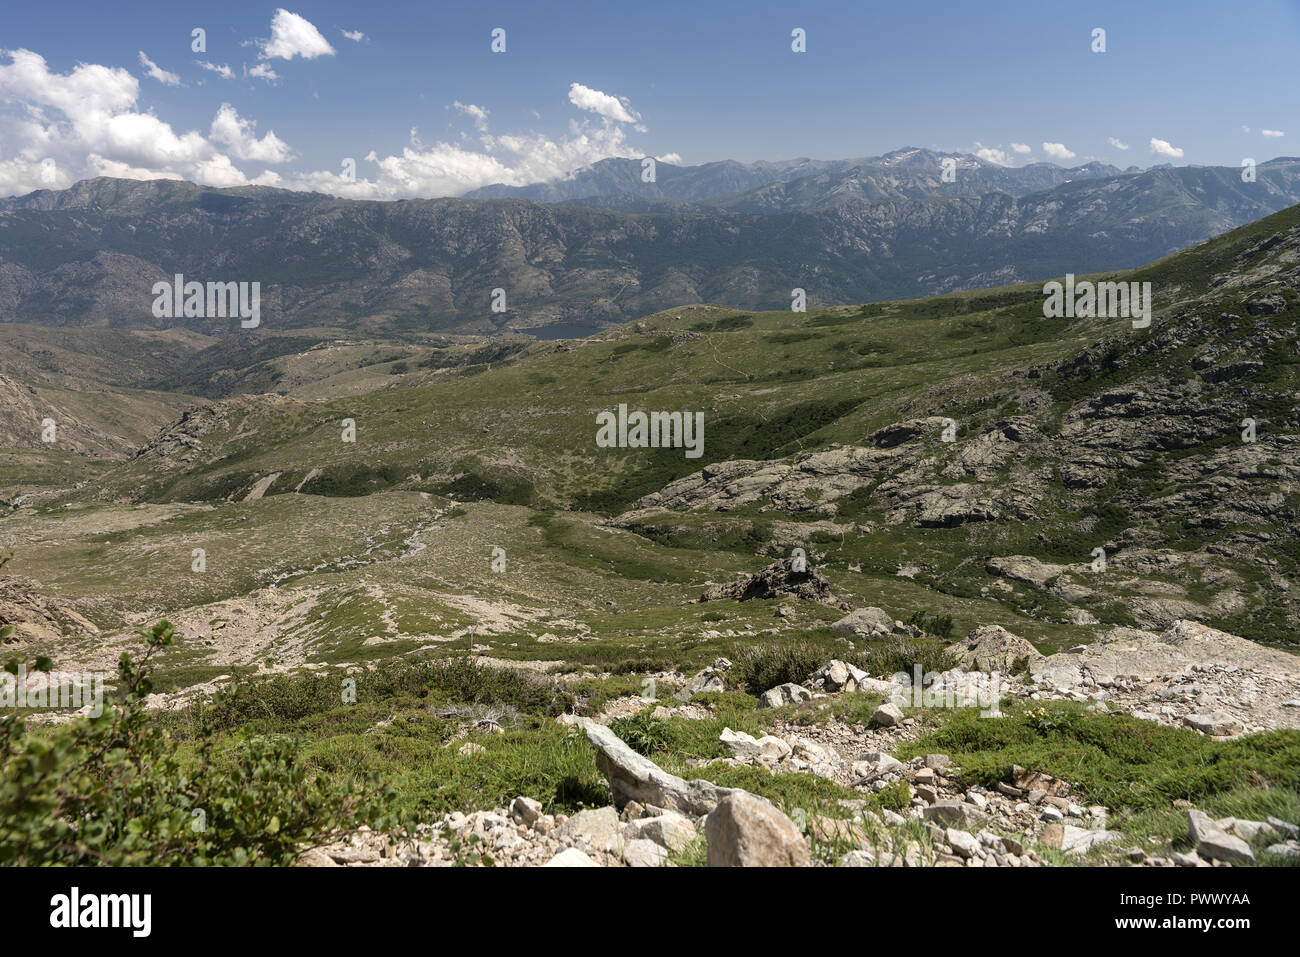 Massif Monte Cinto, the highest mountain in Corsica (2706 m). Masyw Monte Cinto, najwyższa góra na Korsyce (2706 m). - Stock Image